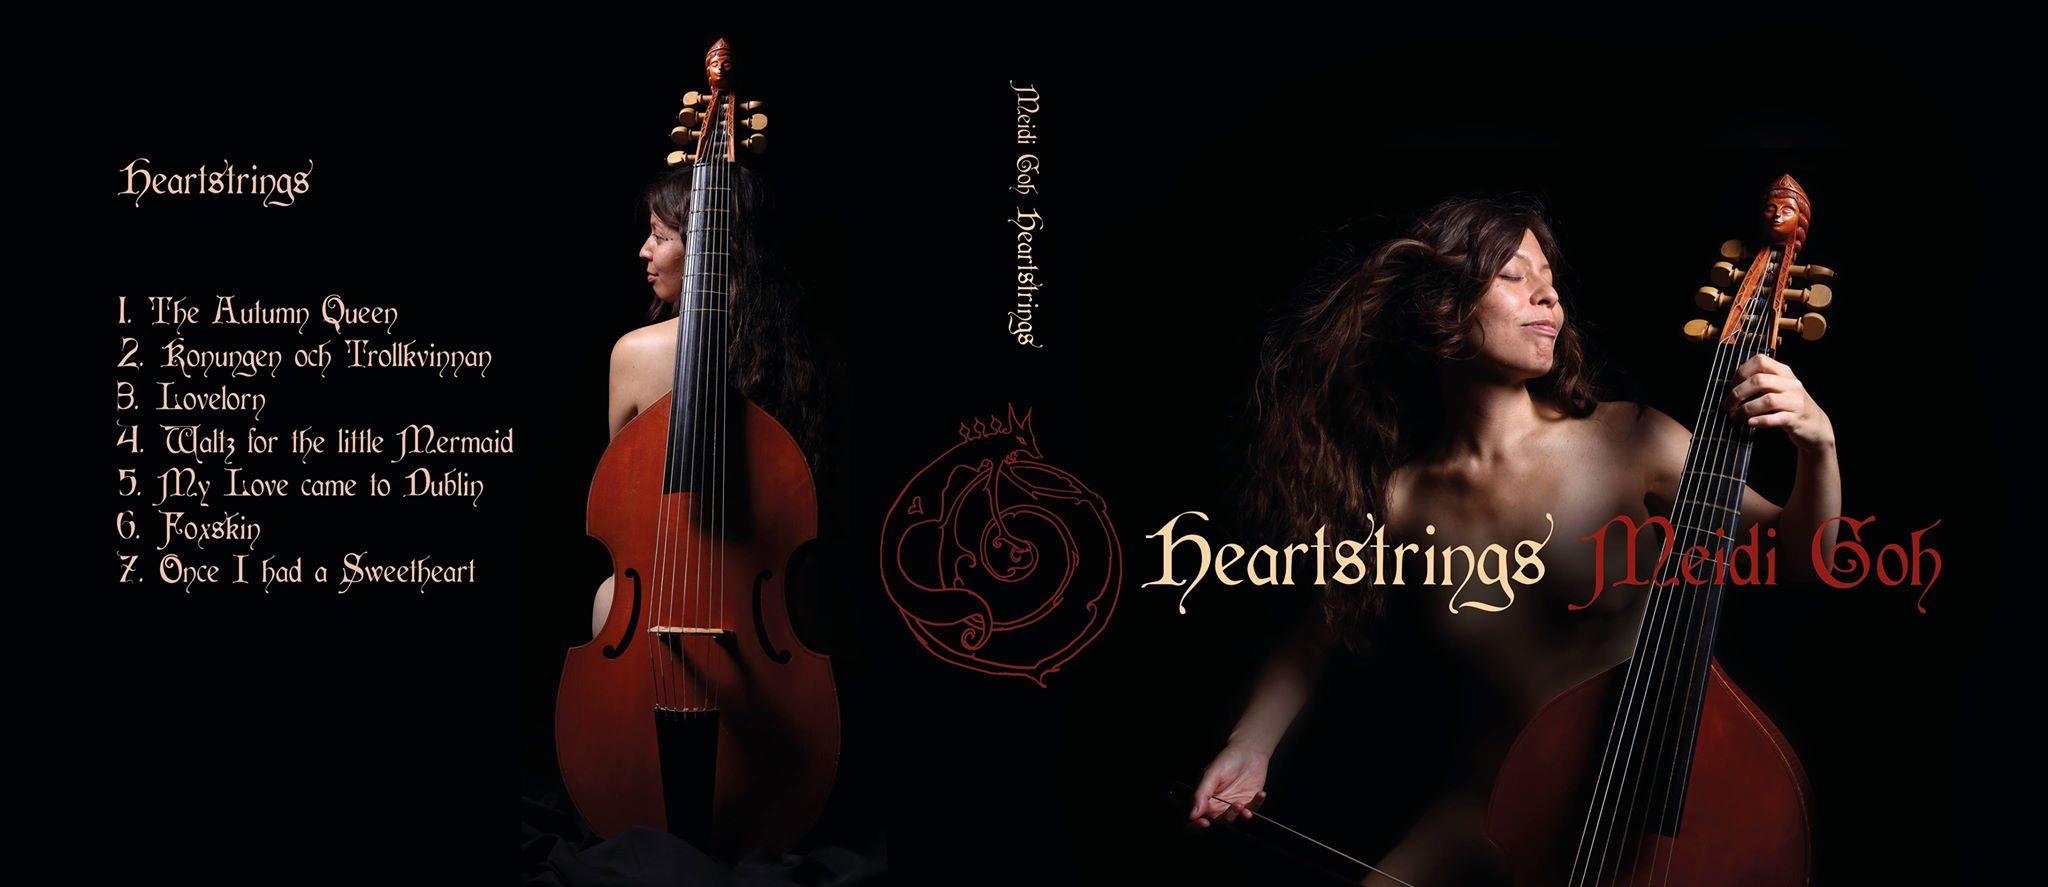 Meidi goh heartstrings cd review